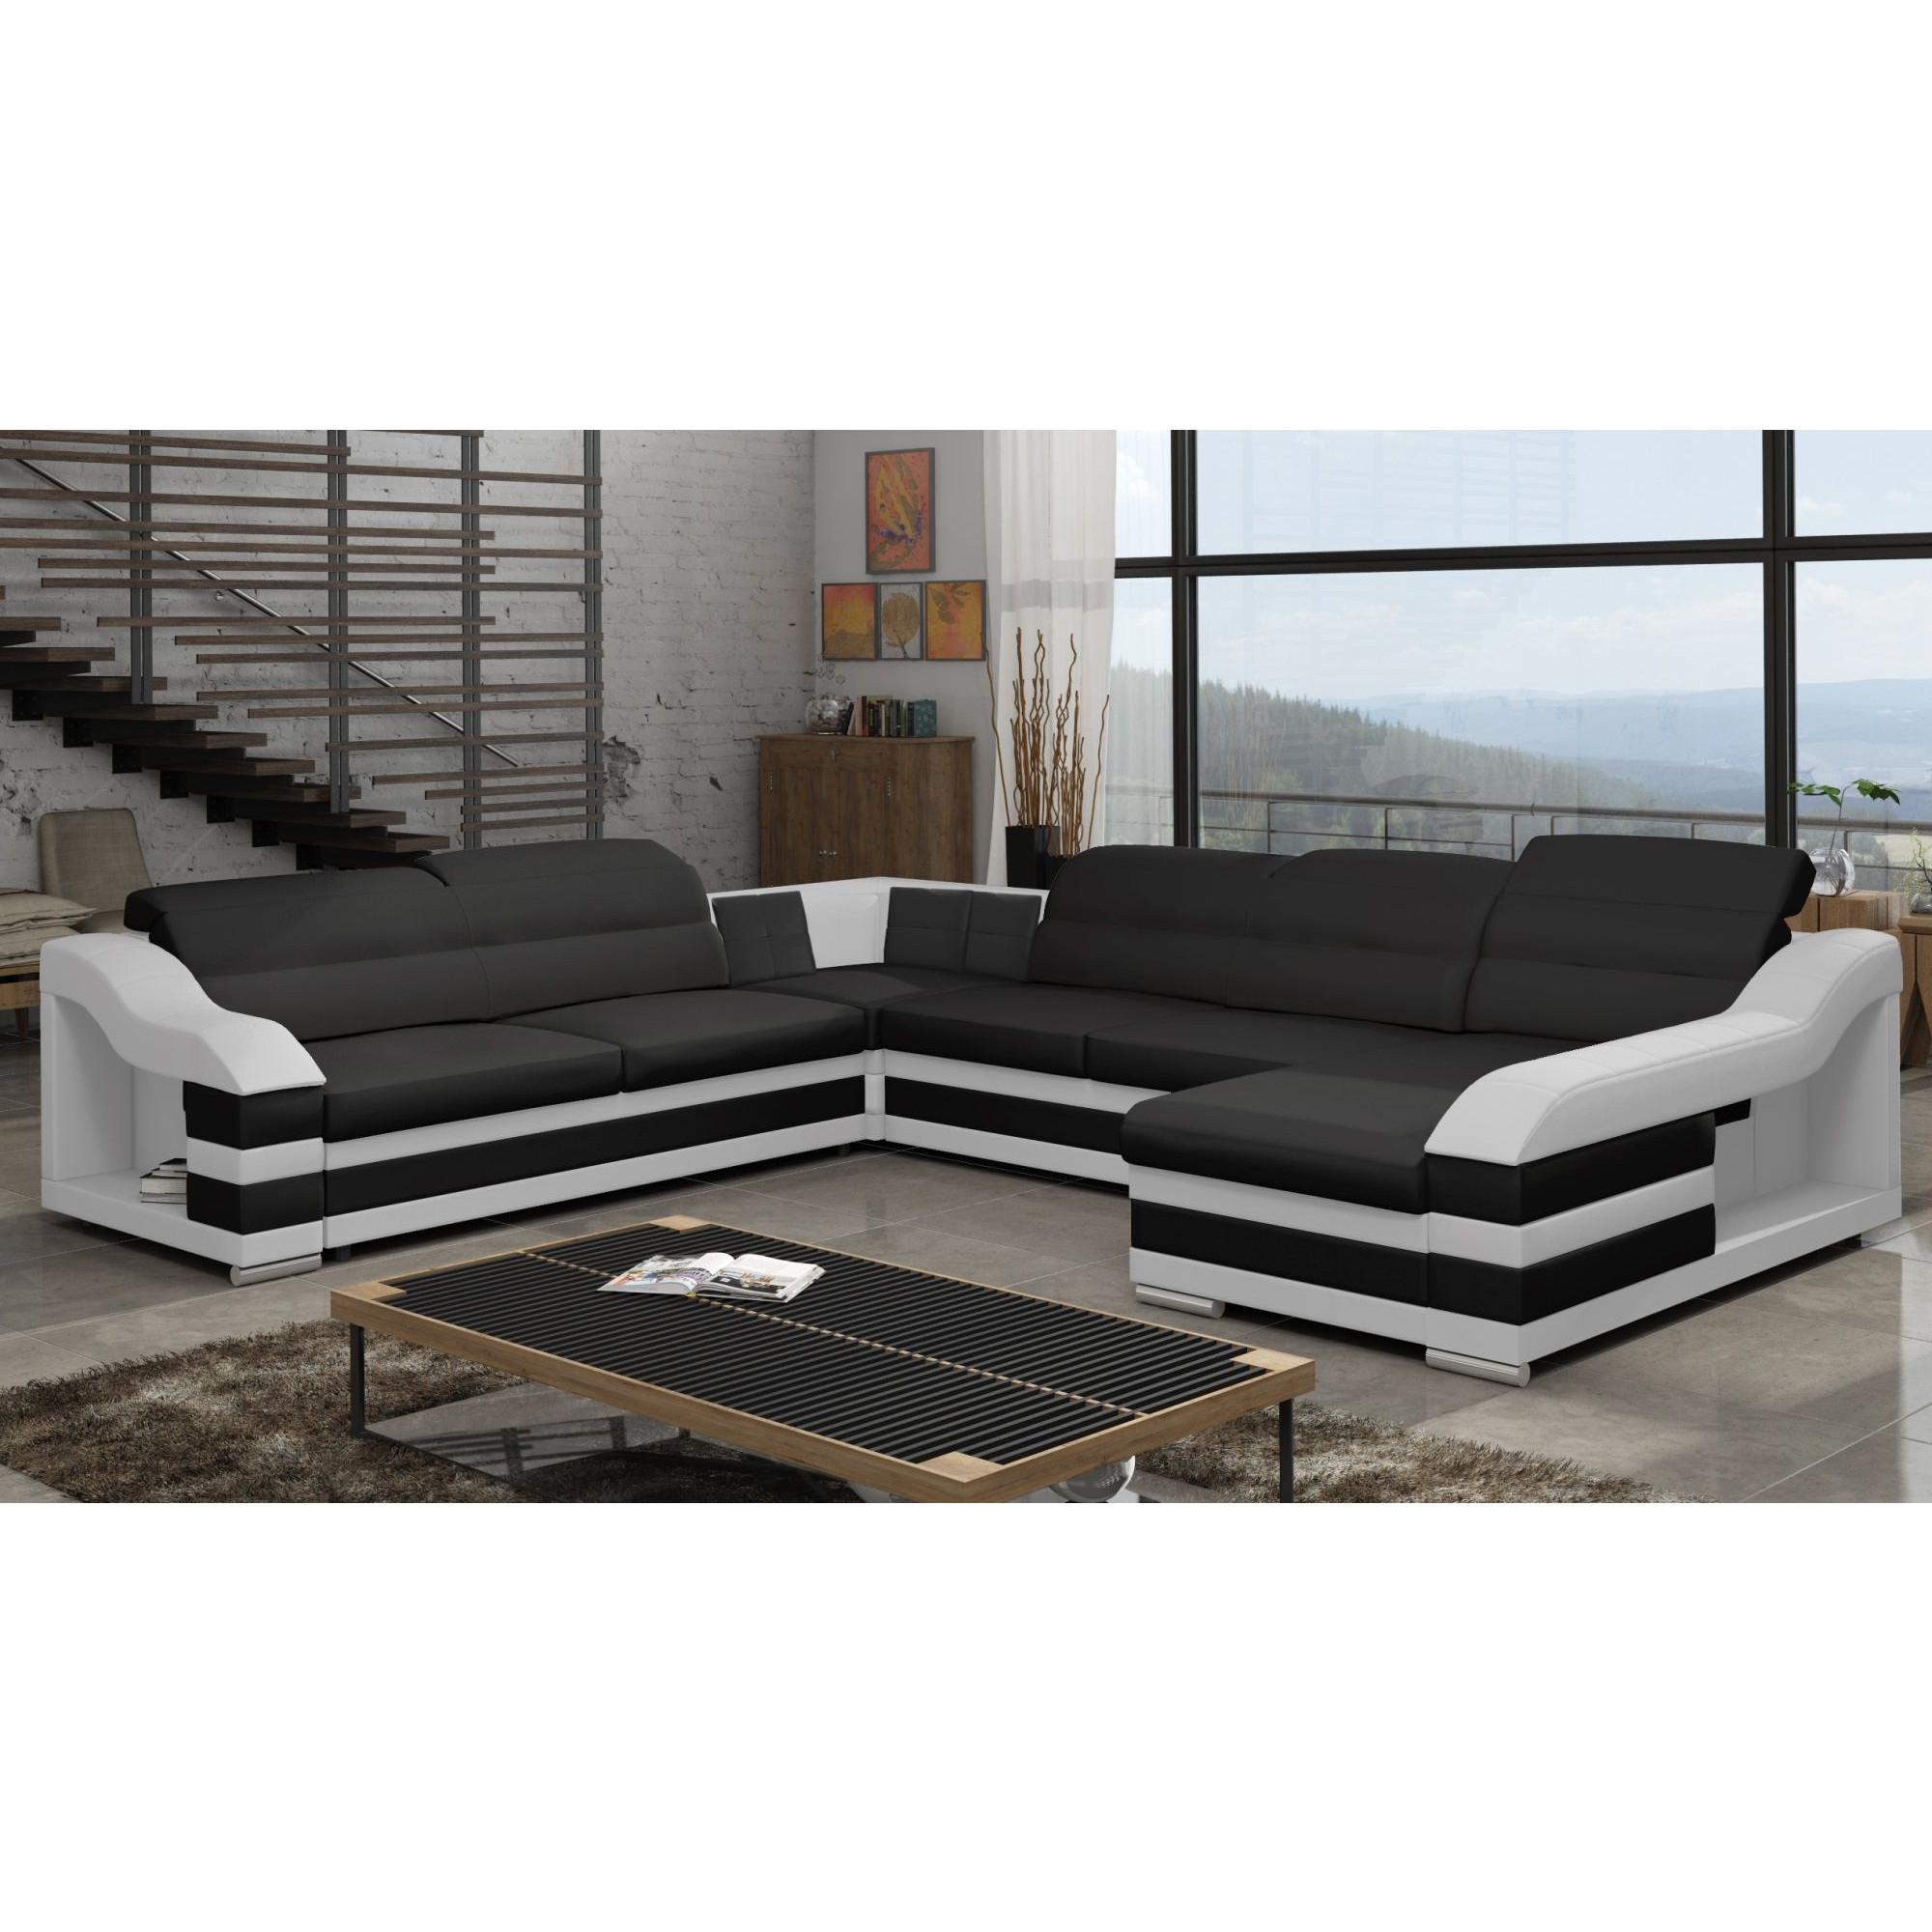 Canapé d angle panoramique convertible design avec